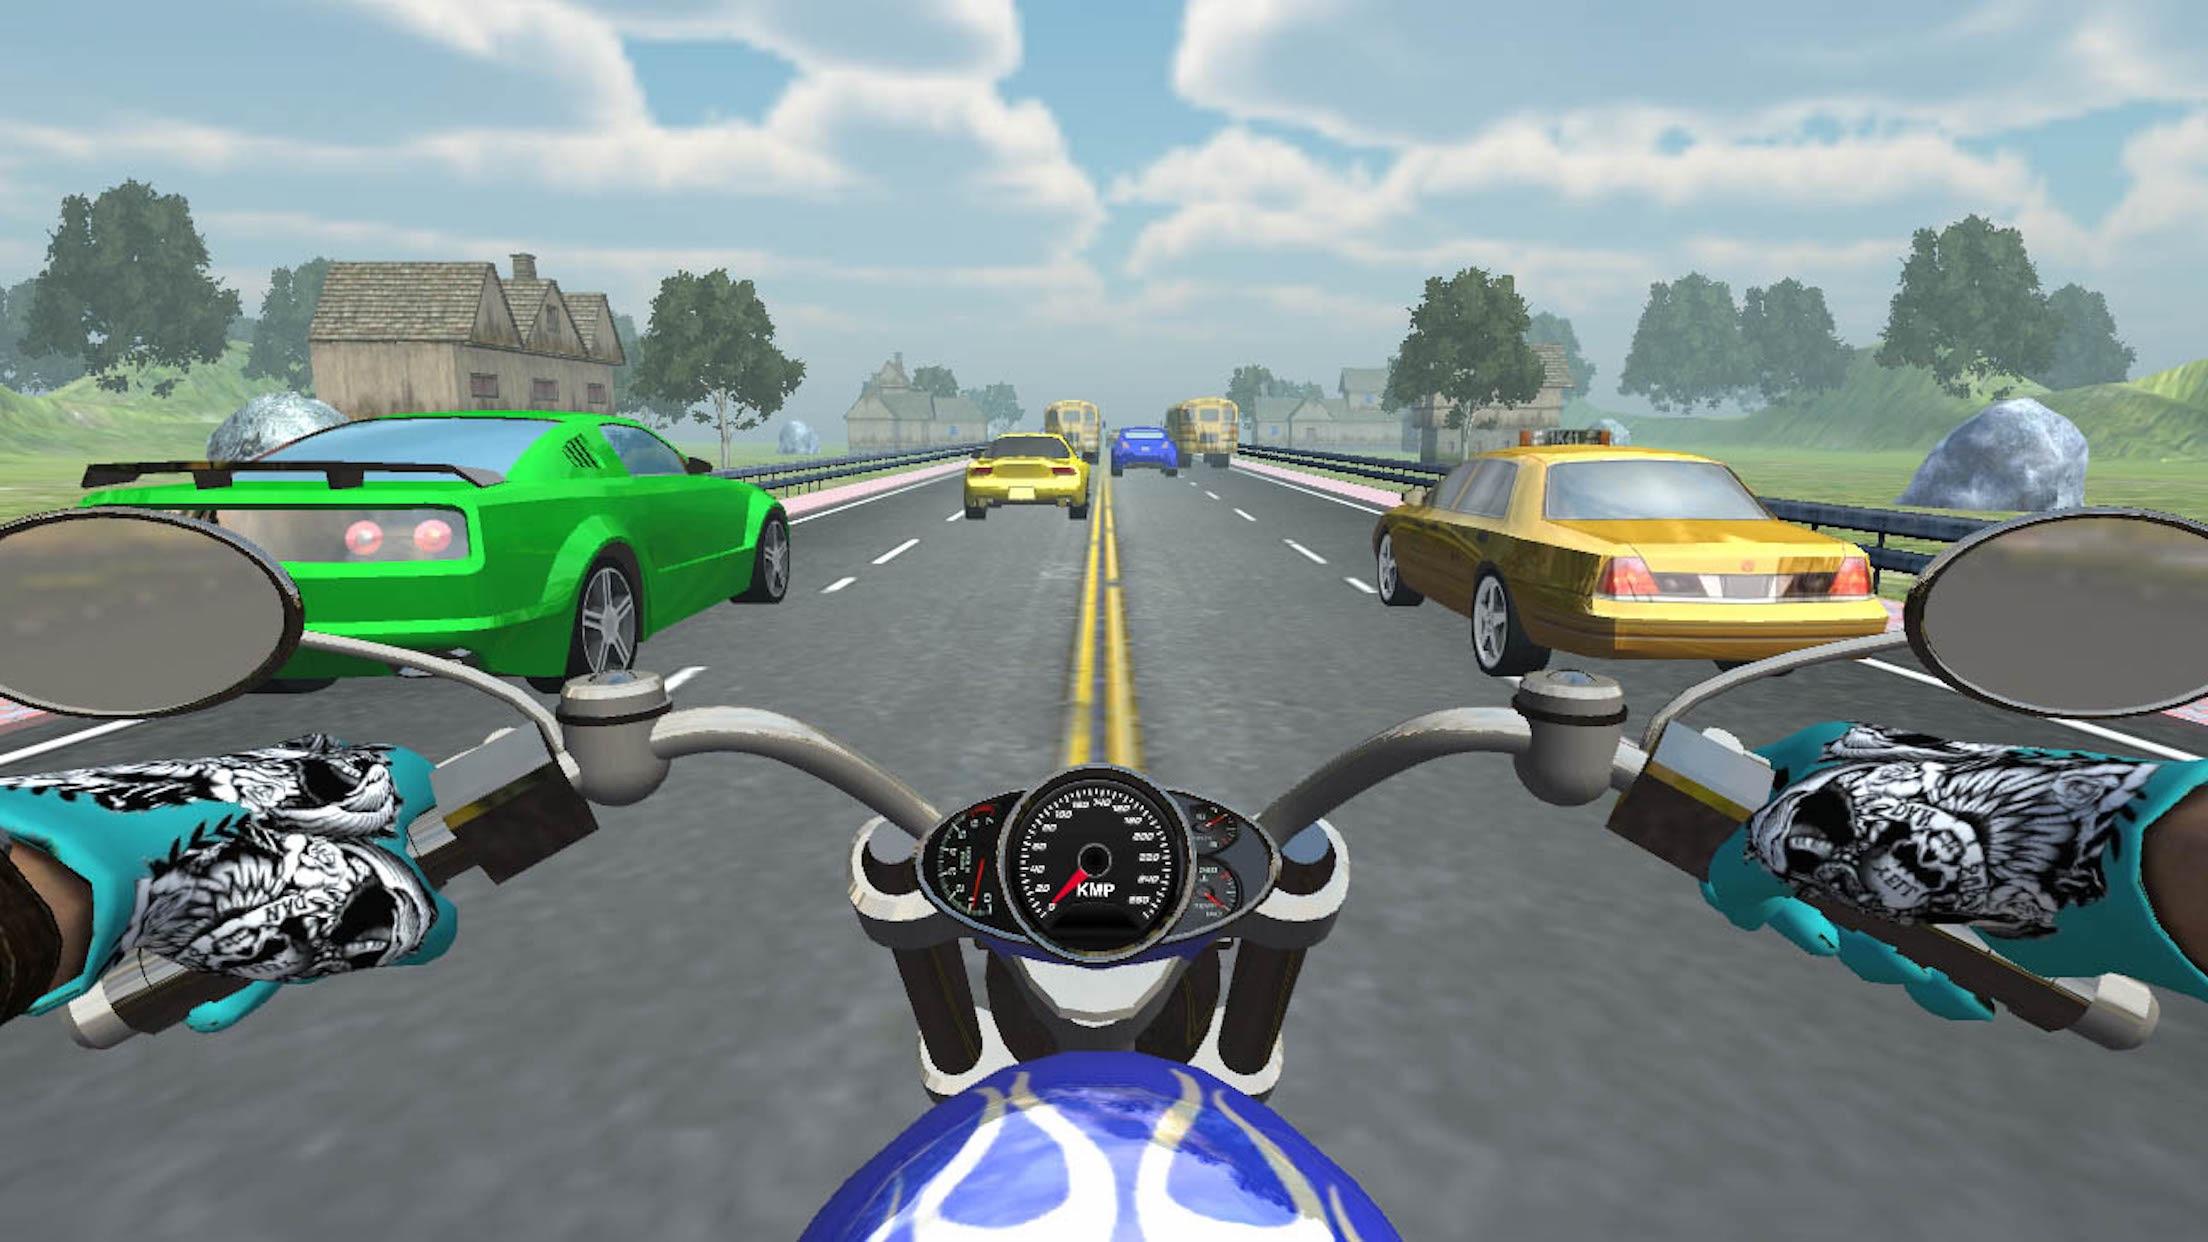 Real Bike Traffic Rider Virtual Reality Glasses Screenshot